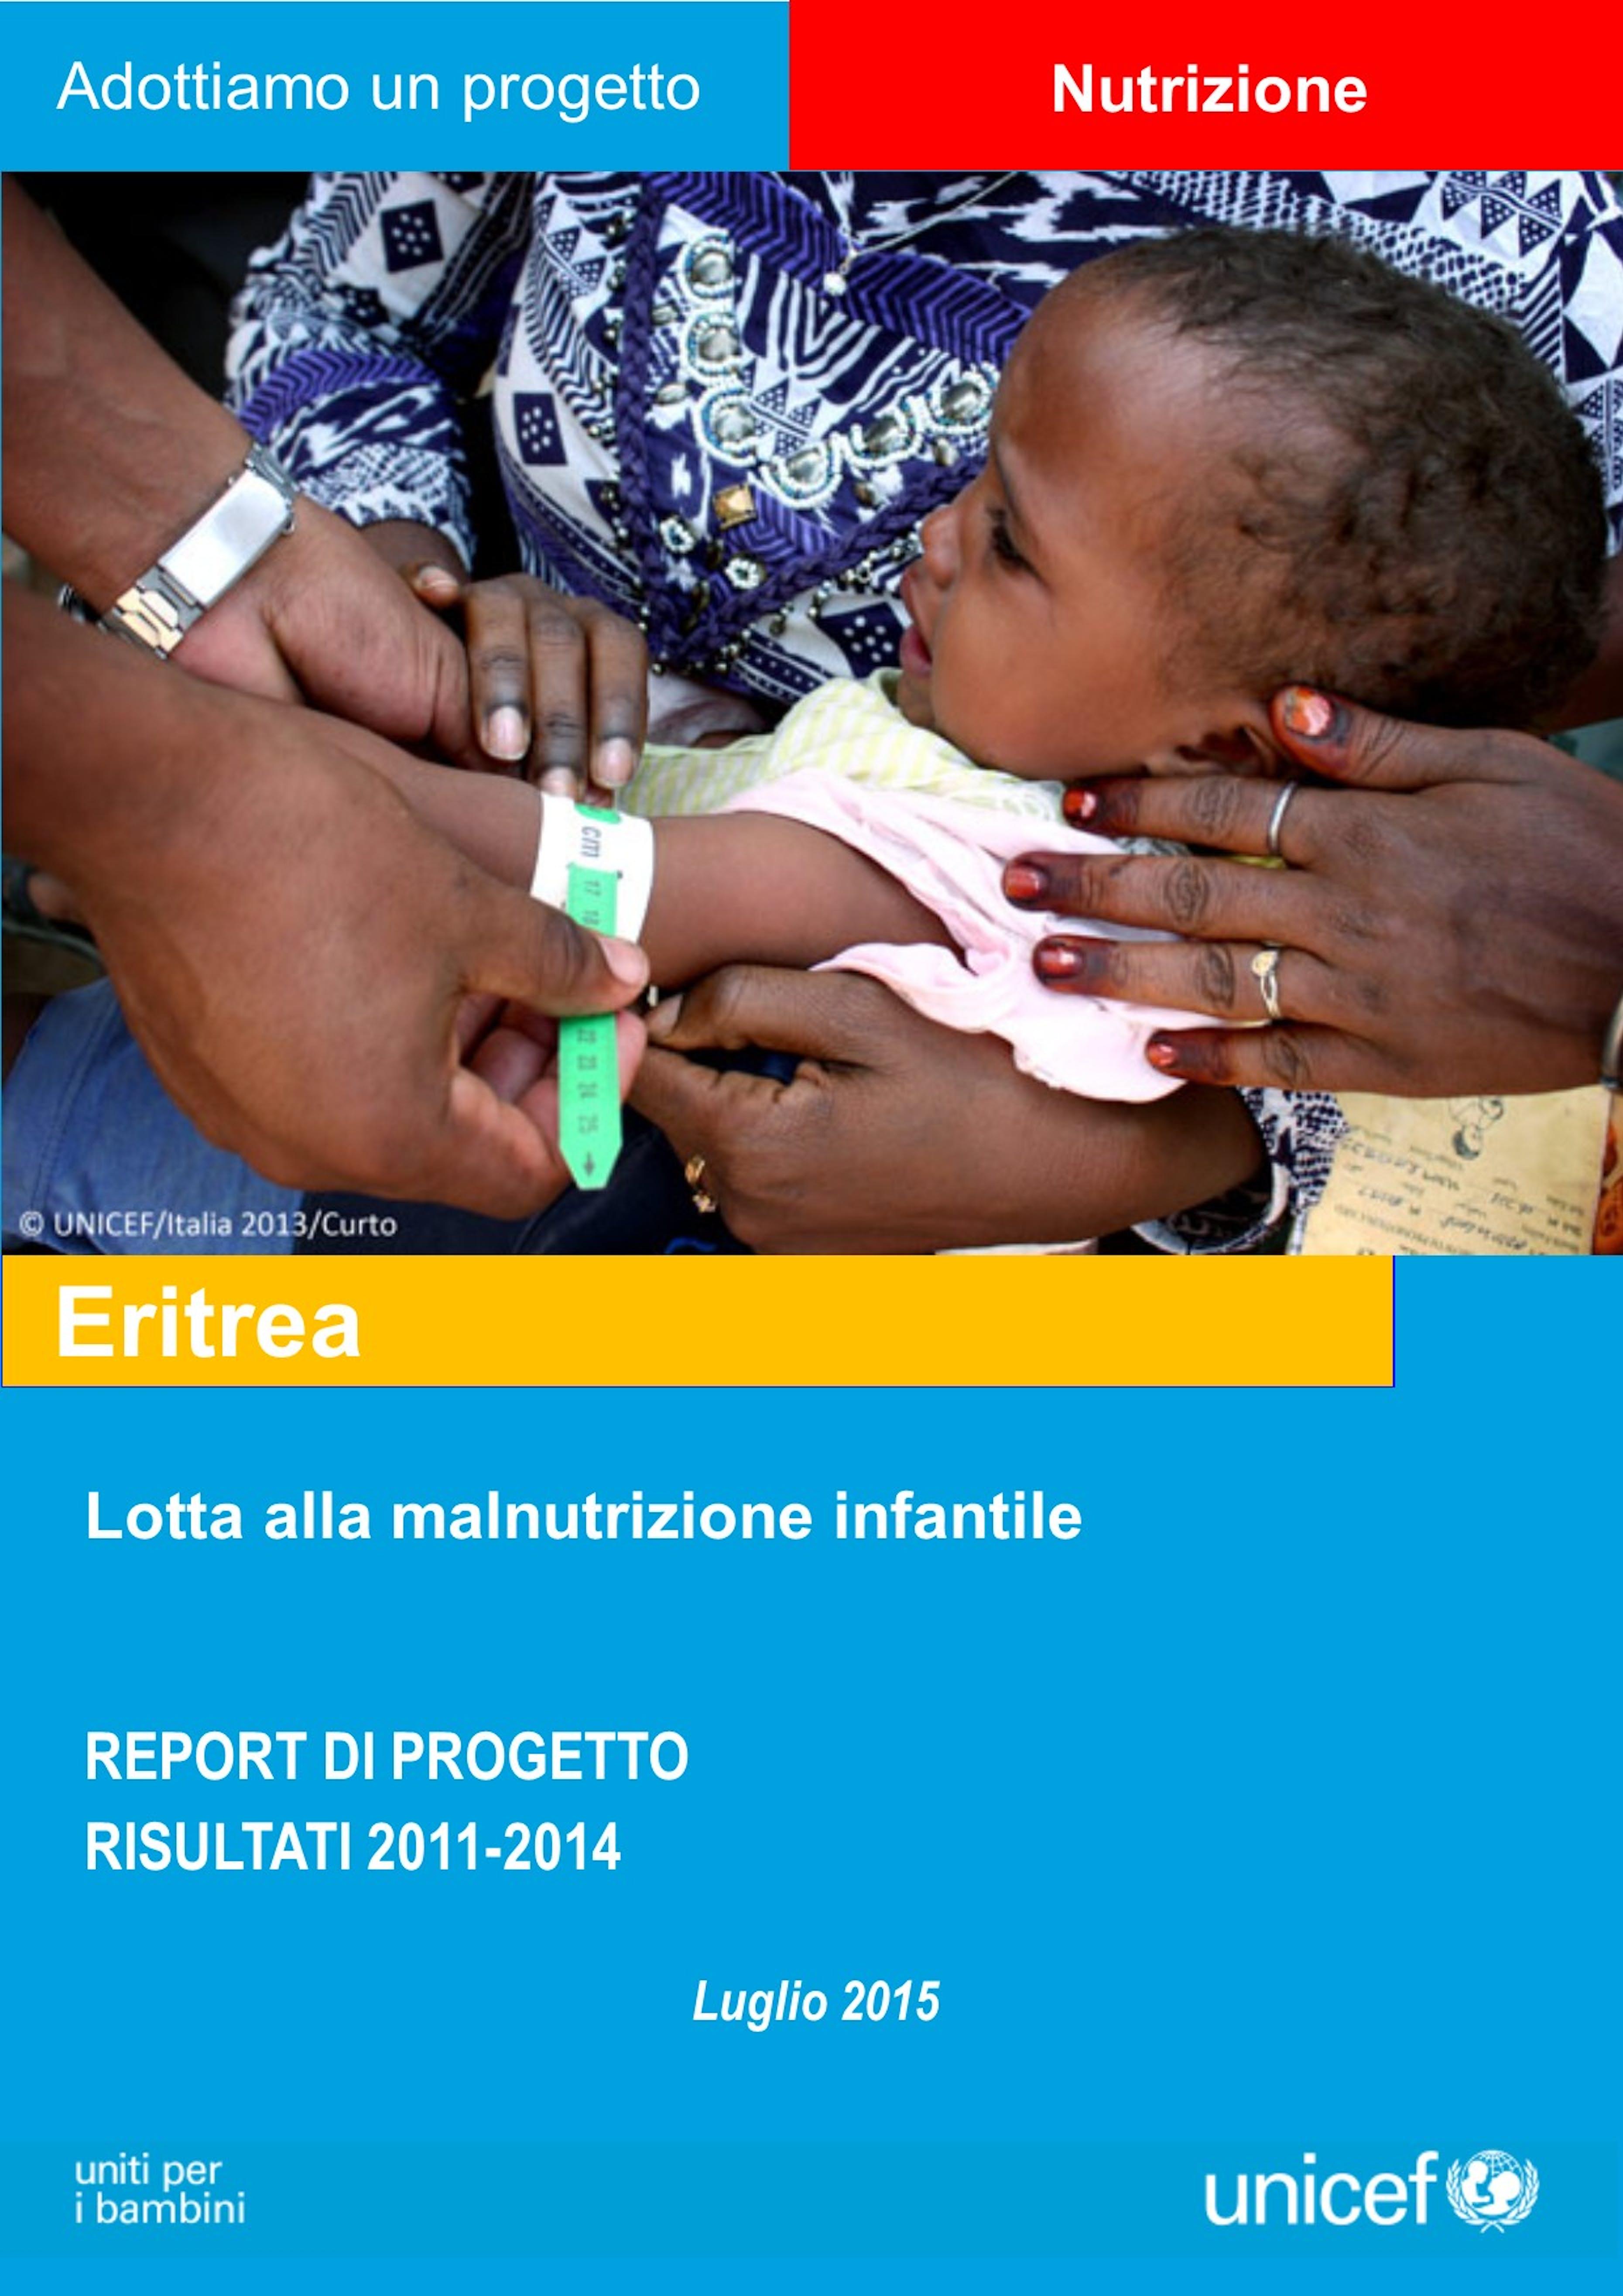 Eritrea_Copertina_Report.jpg